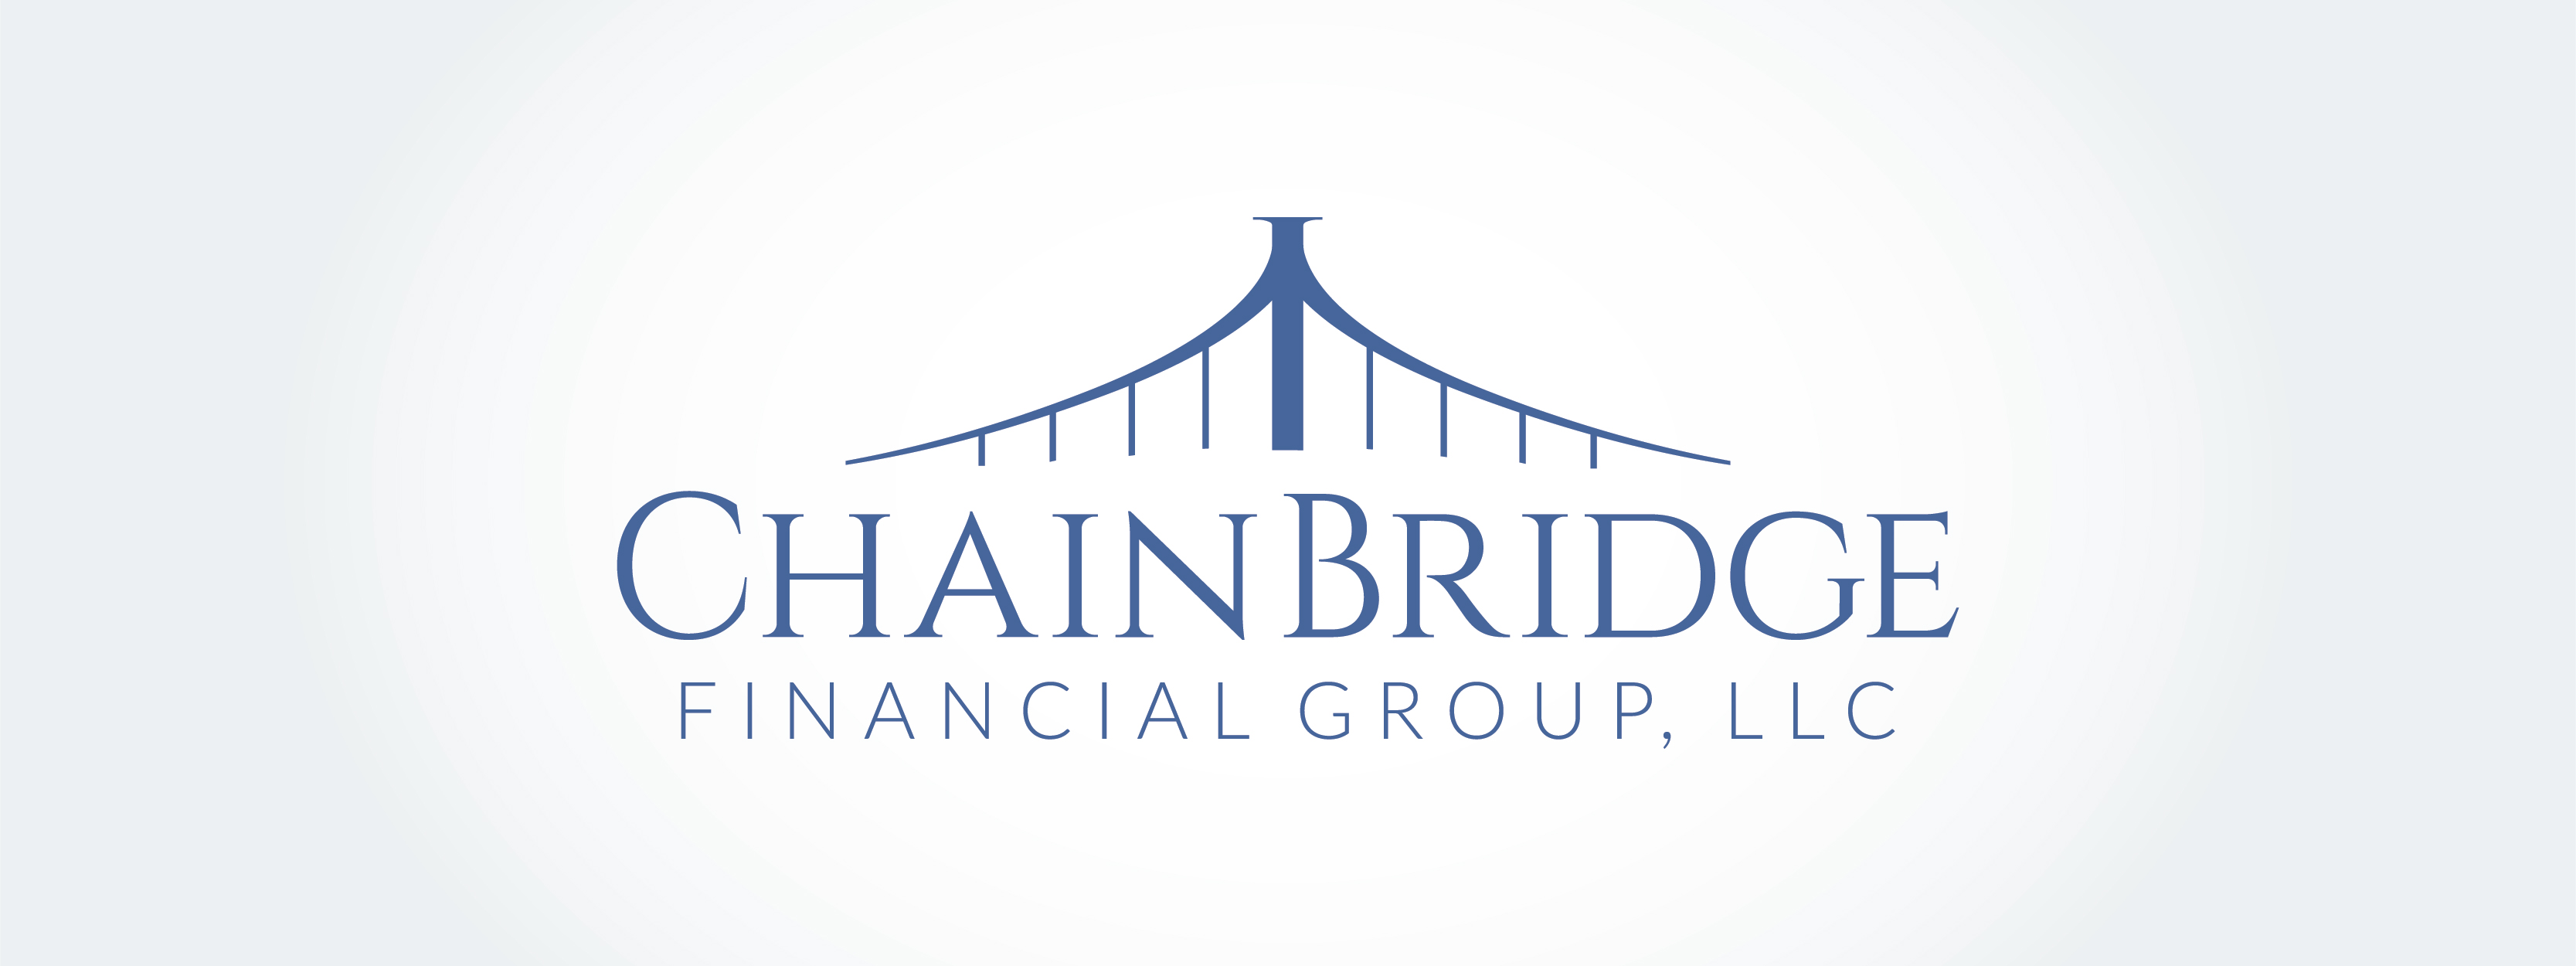 Chain Bridge Financial Group LLC logo Featured Image